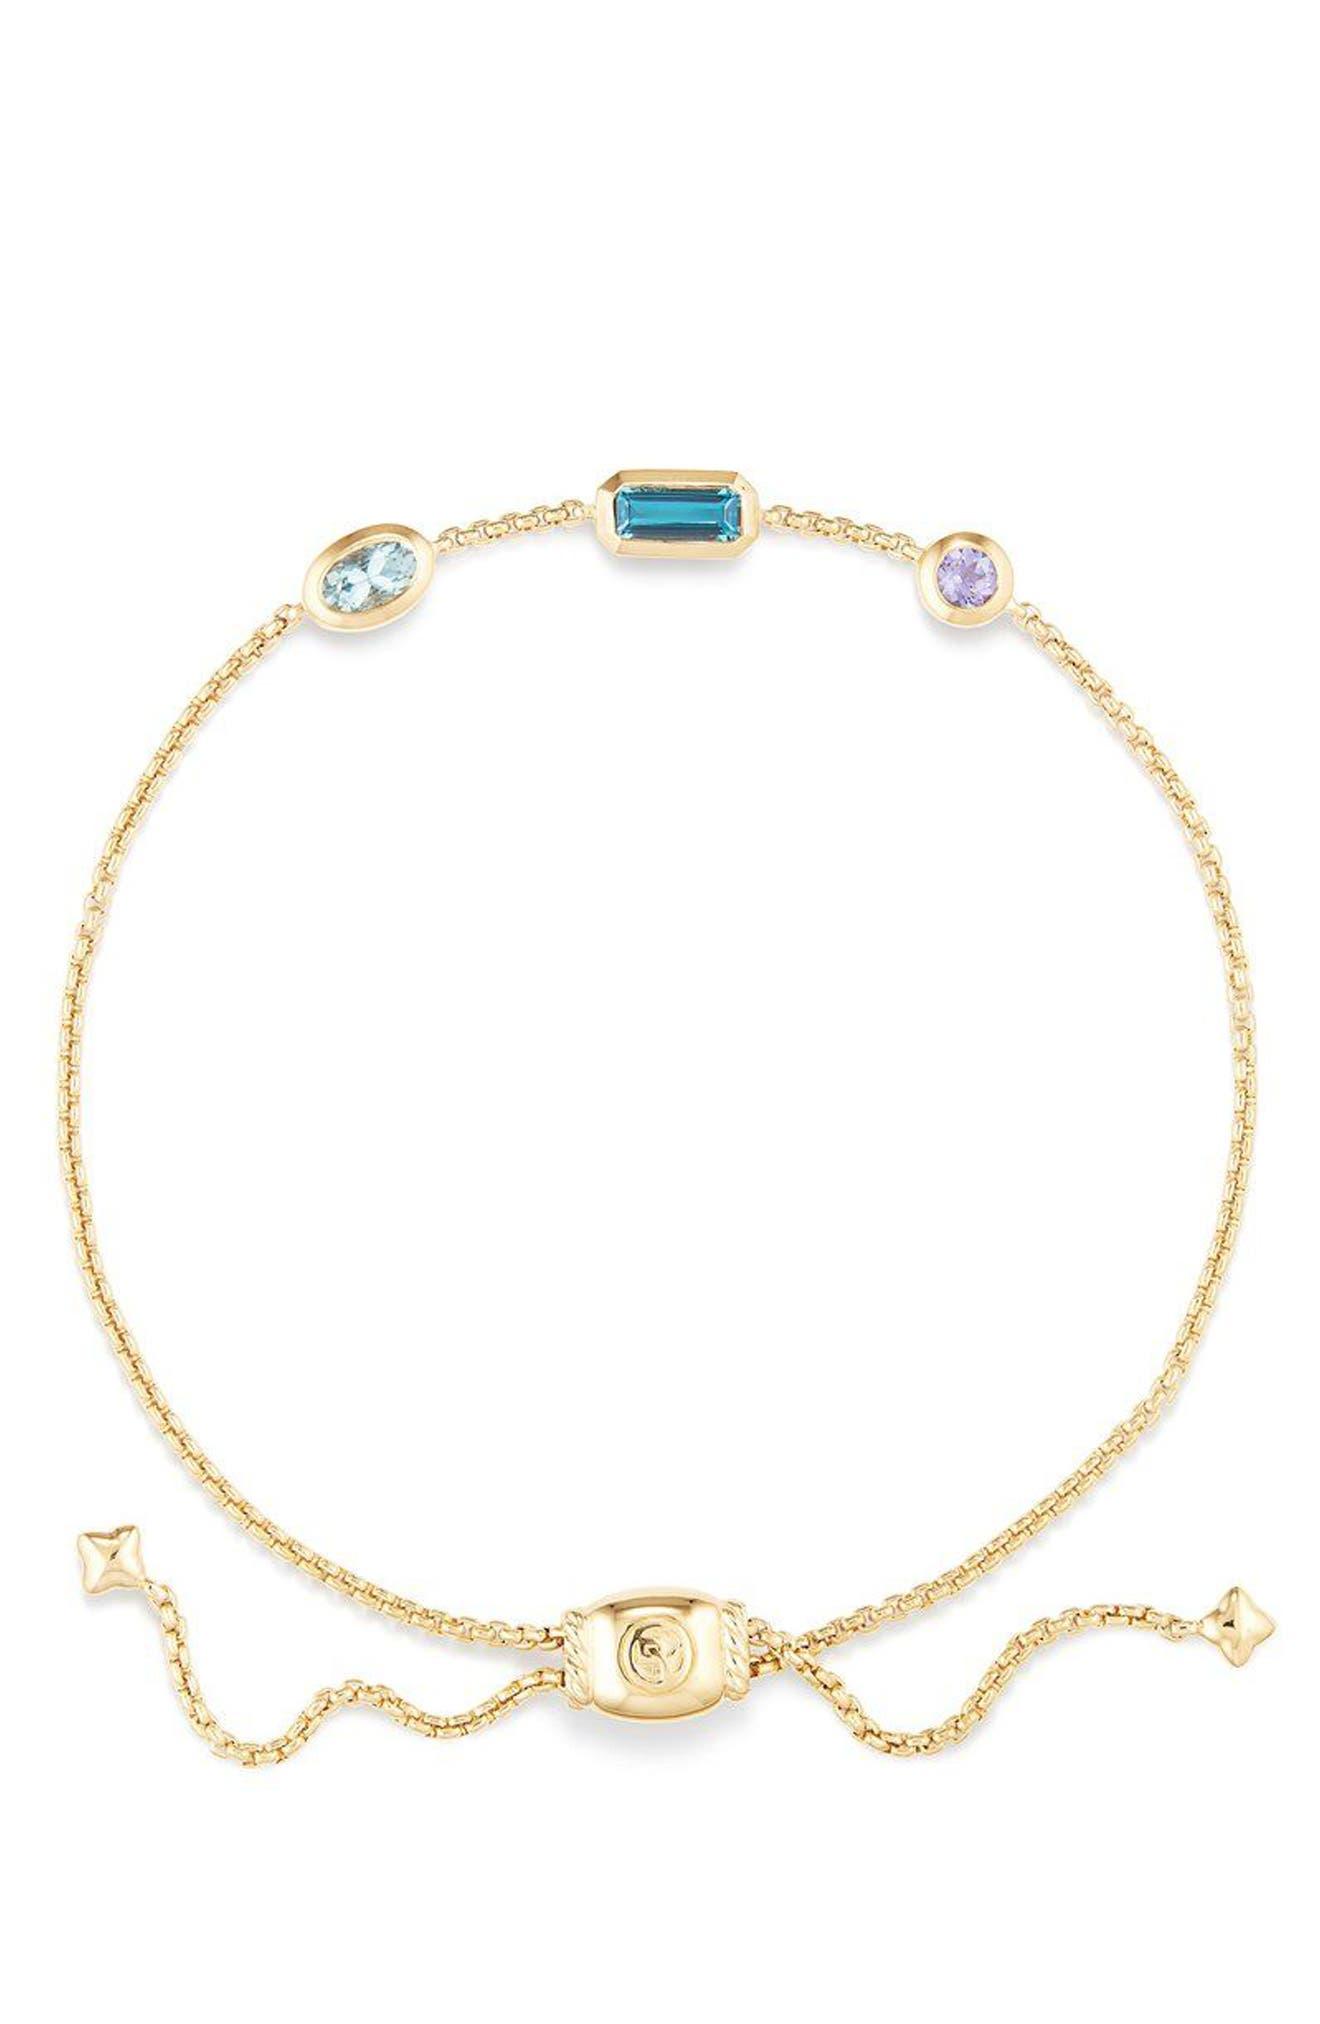 Novella Chain Bracelet in 18K Gold,                             Alternate thumbnail 2, color,                             GOLD/ HAMPTON BLUE TOPAZ